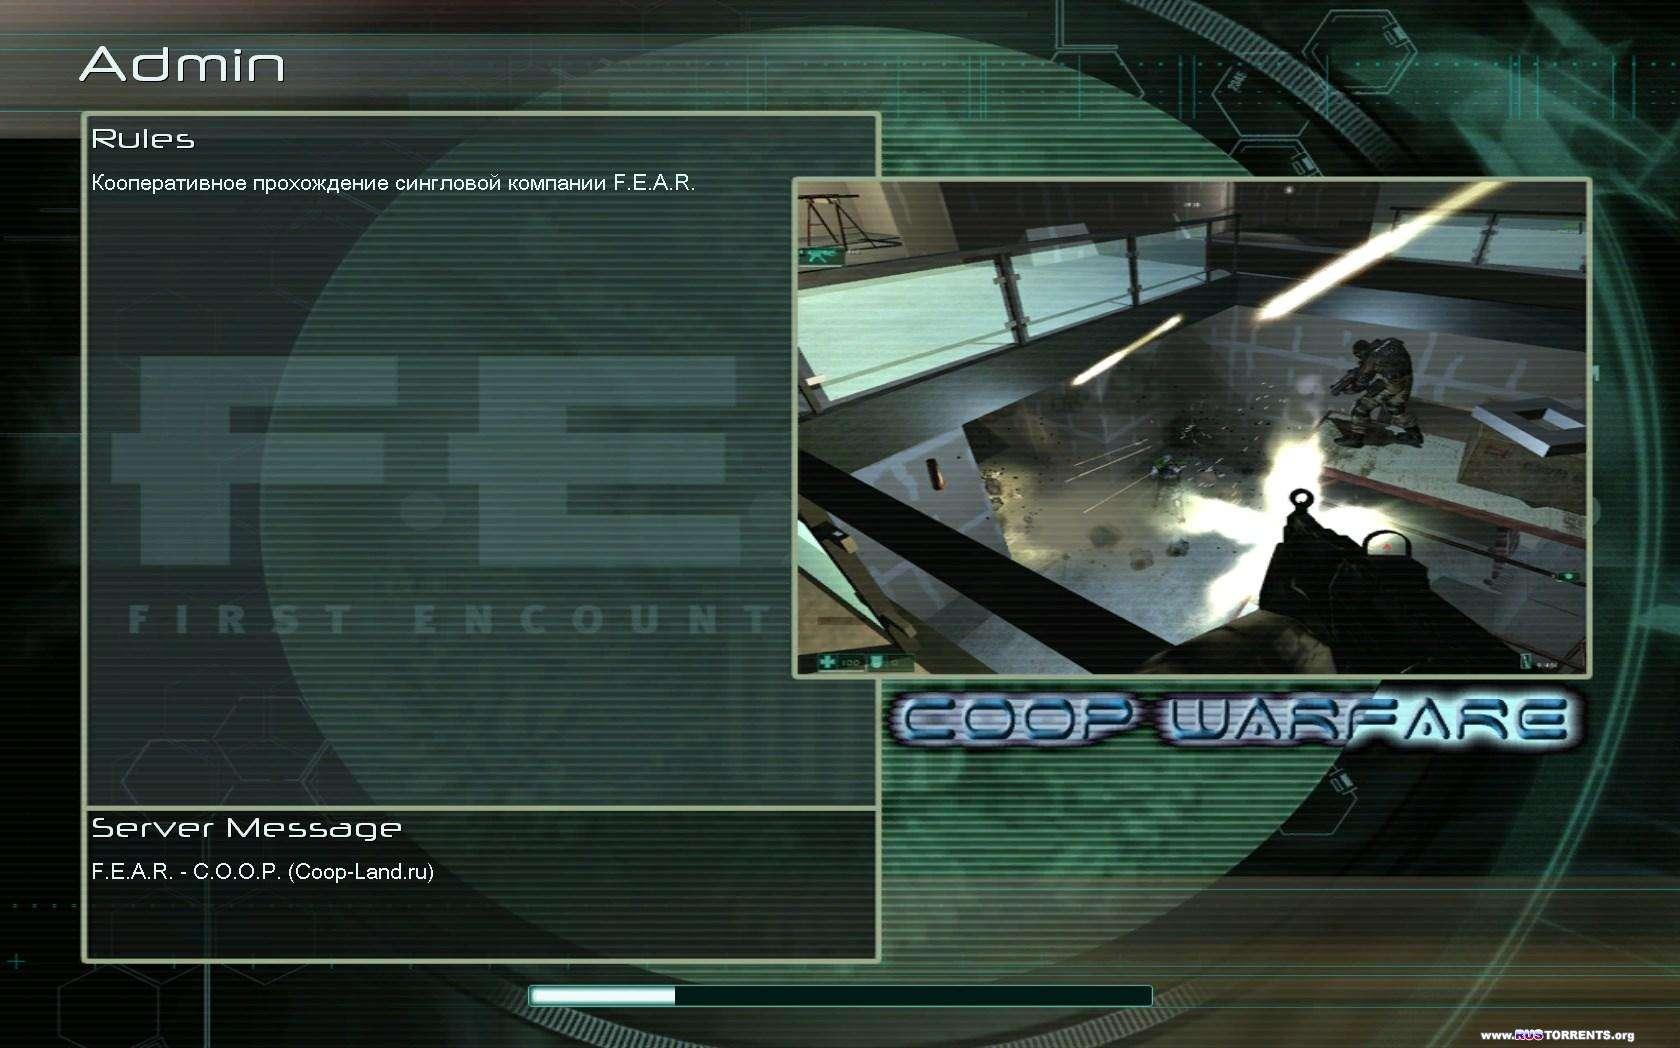 F.E.A.R. COOP | РС | Repack от Coop-Land